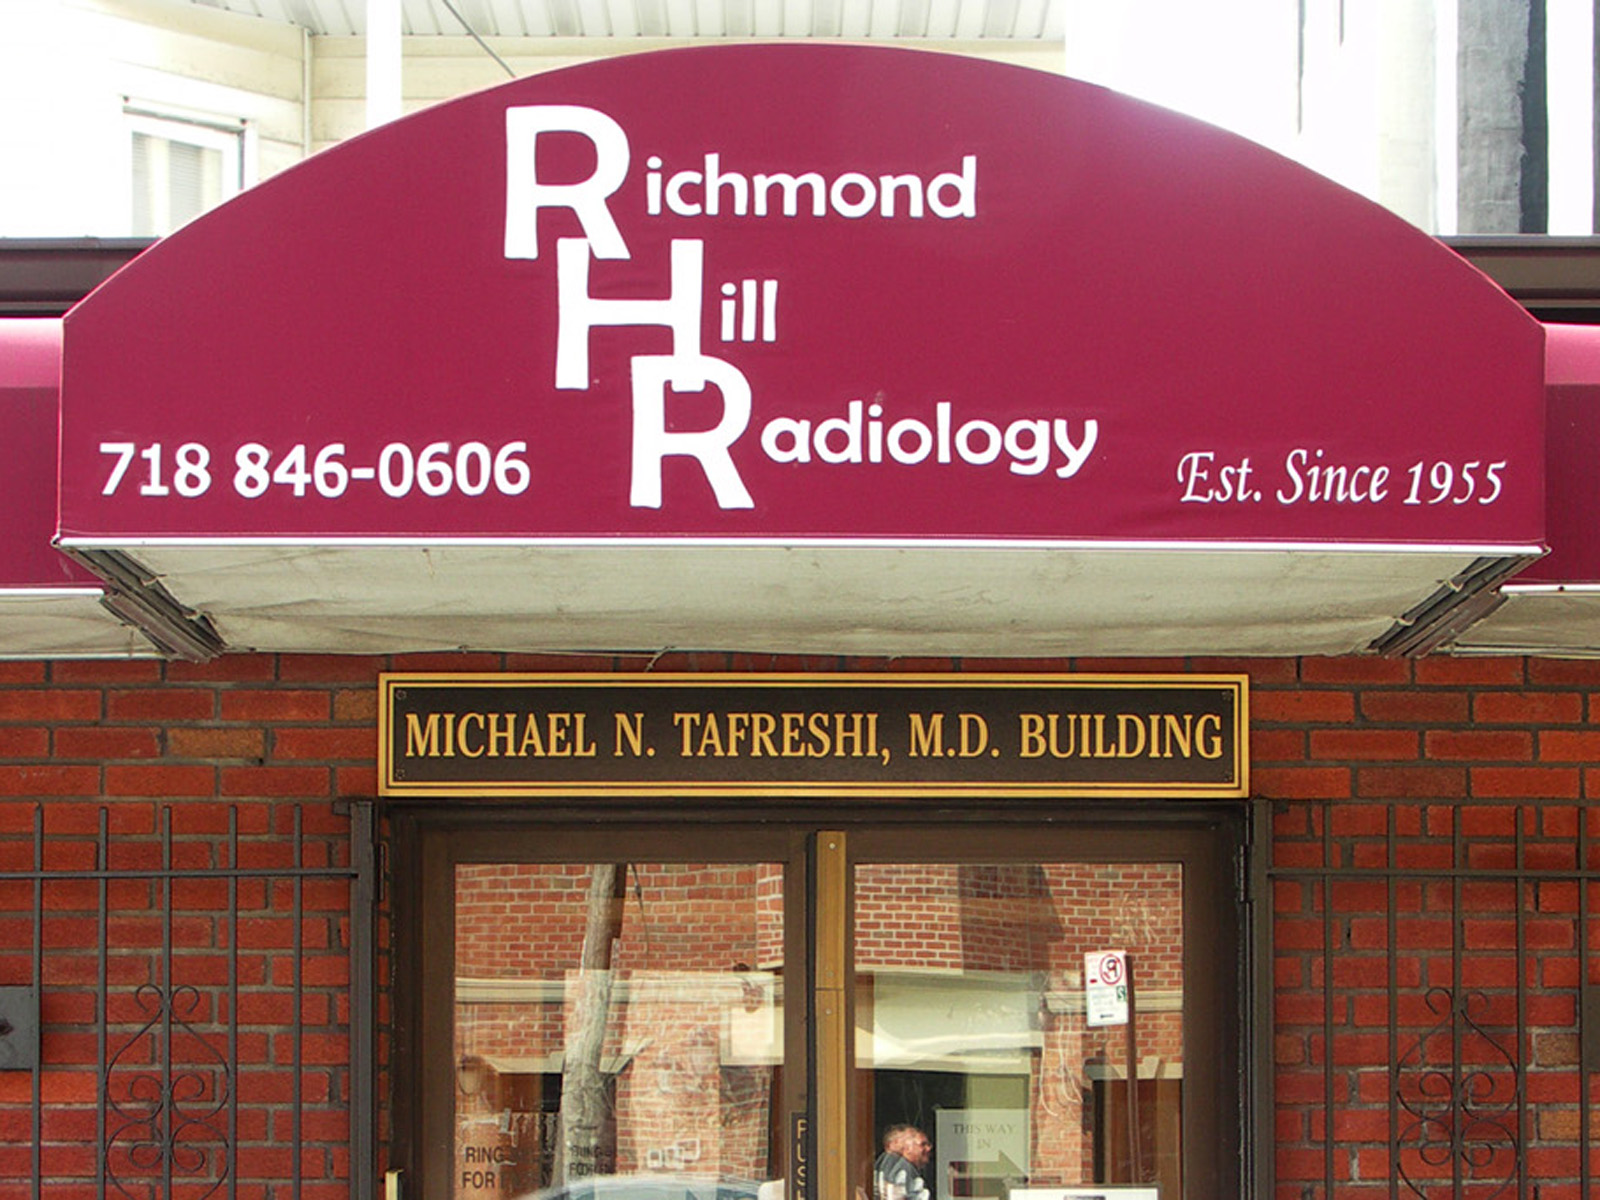 Richmond Hill Radiology - About Us